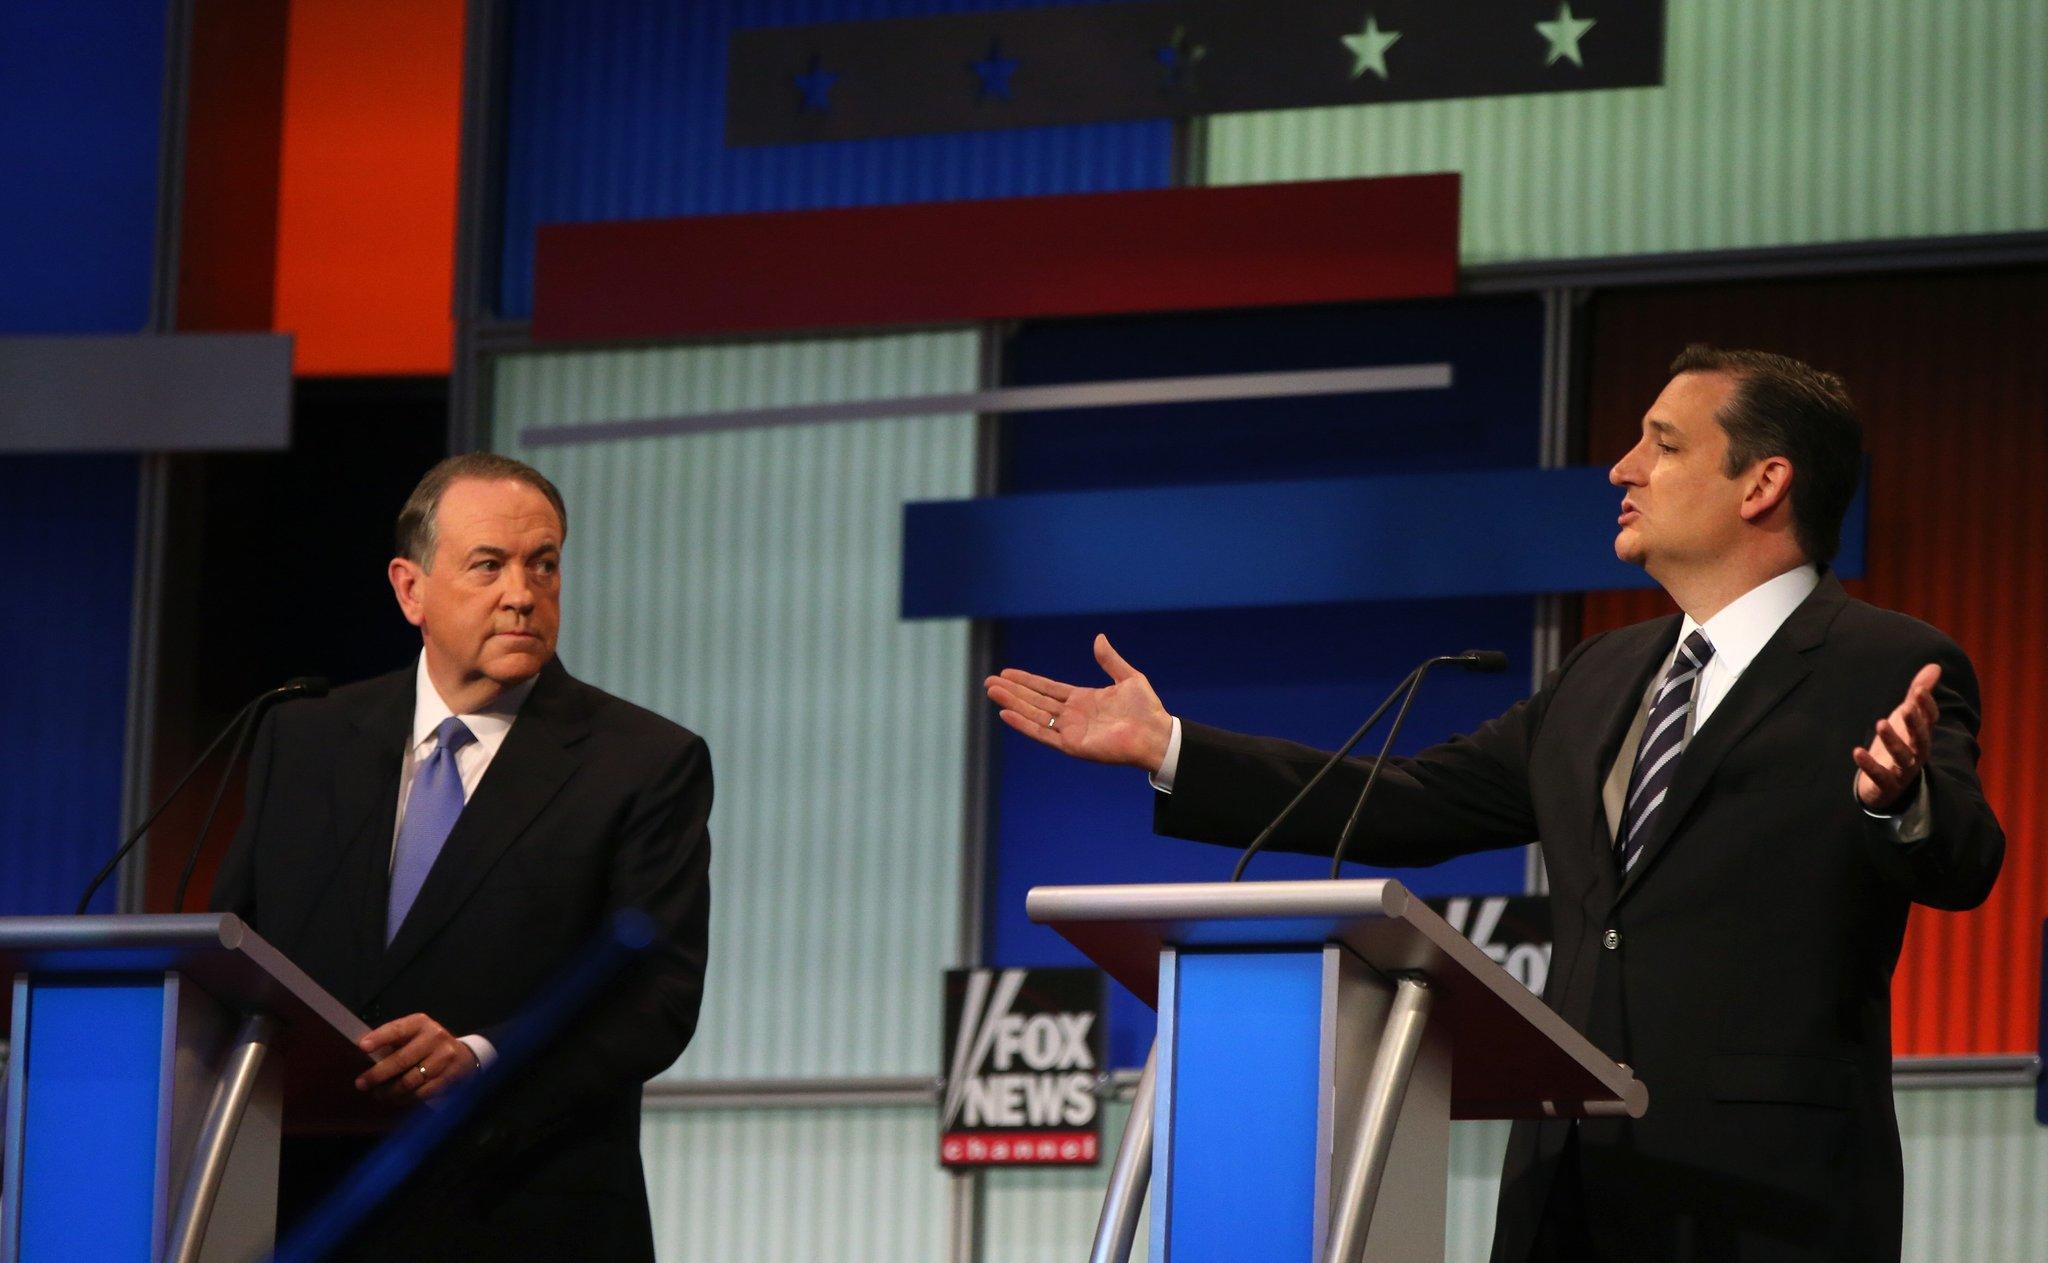 Texas Sen. Ted Cruz speaks as former Arkansas Gov. Mike Huckabee listens. (Andrew Harnik / Associated Press)